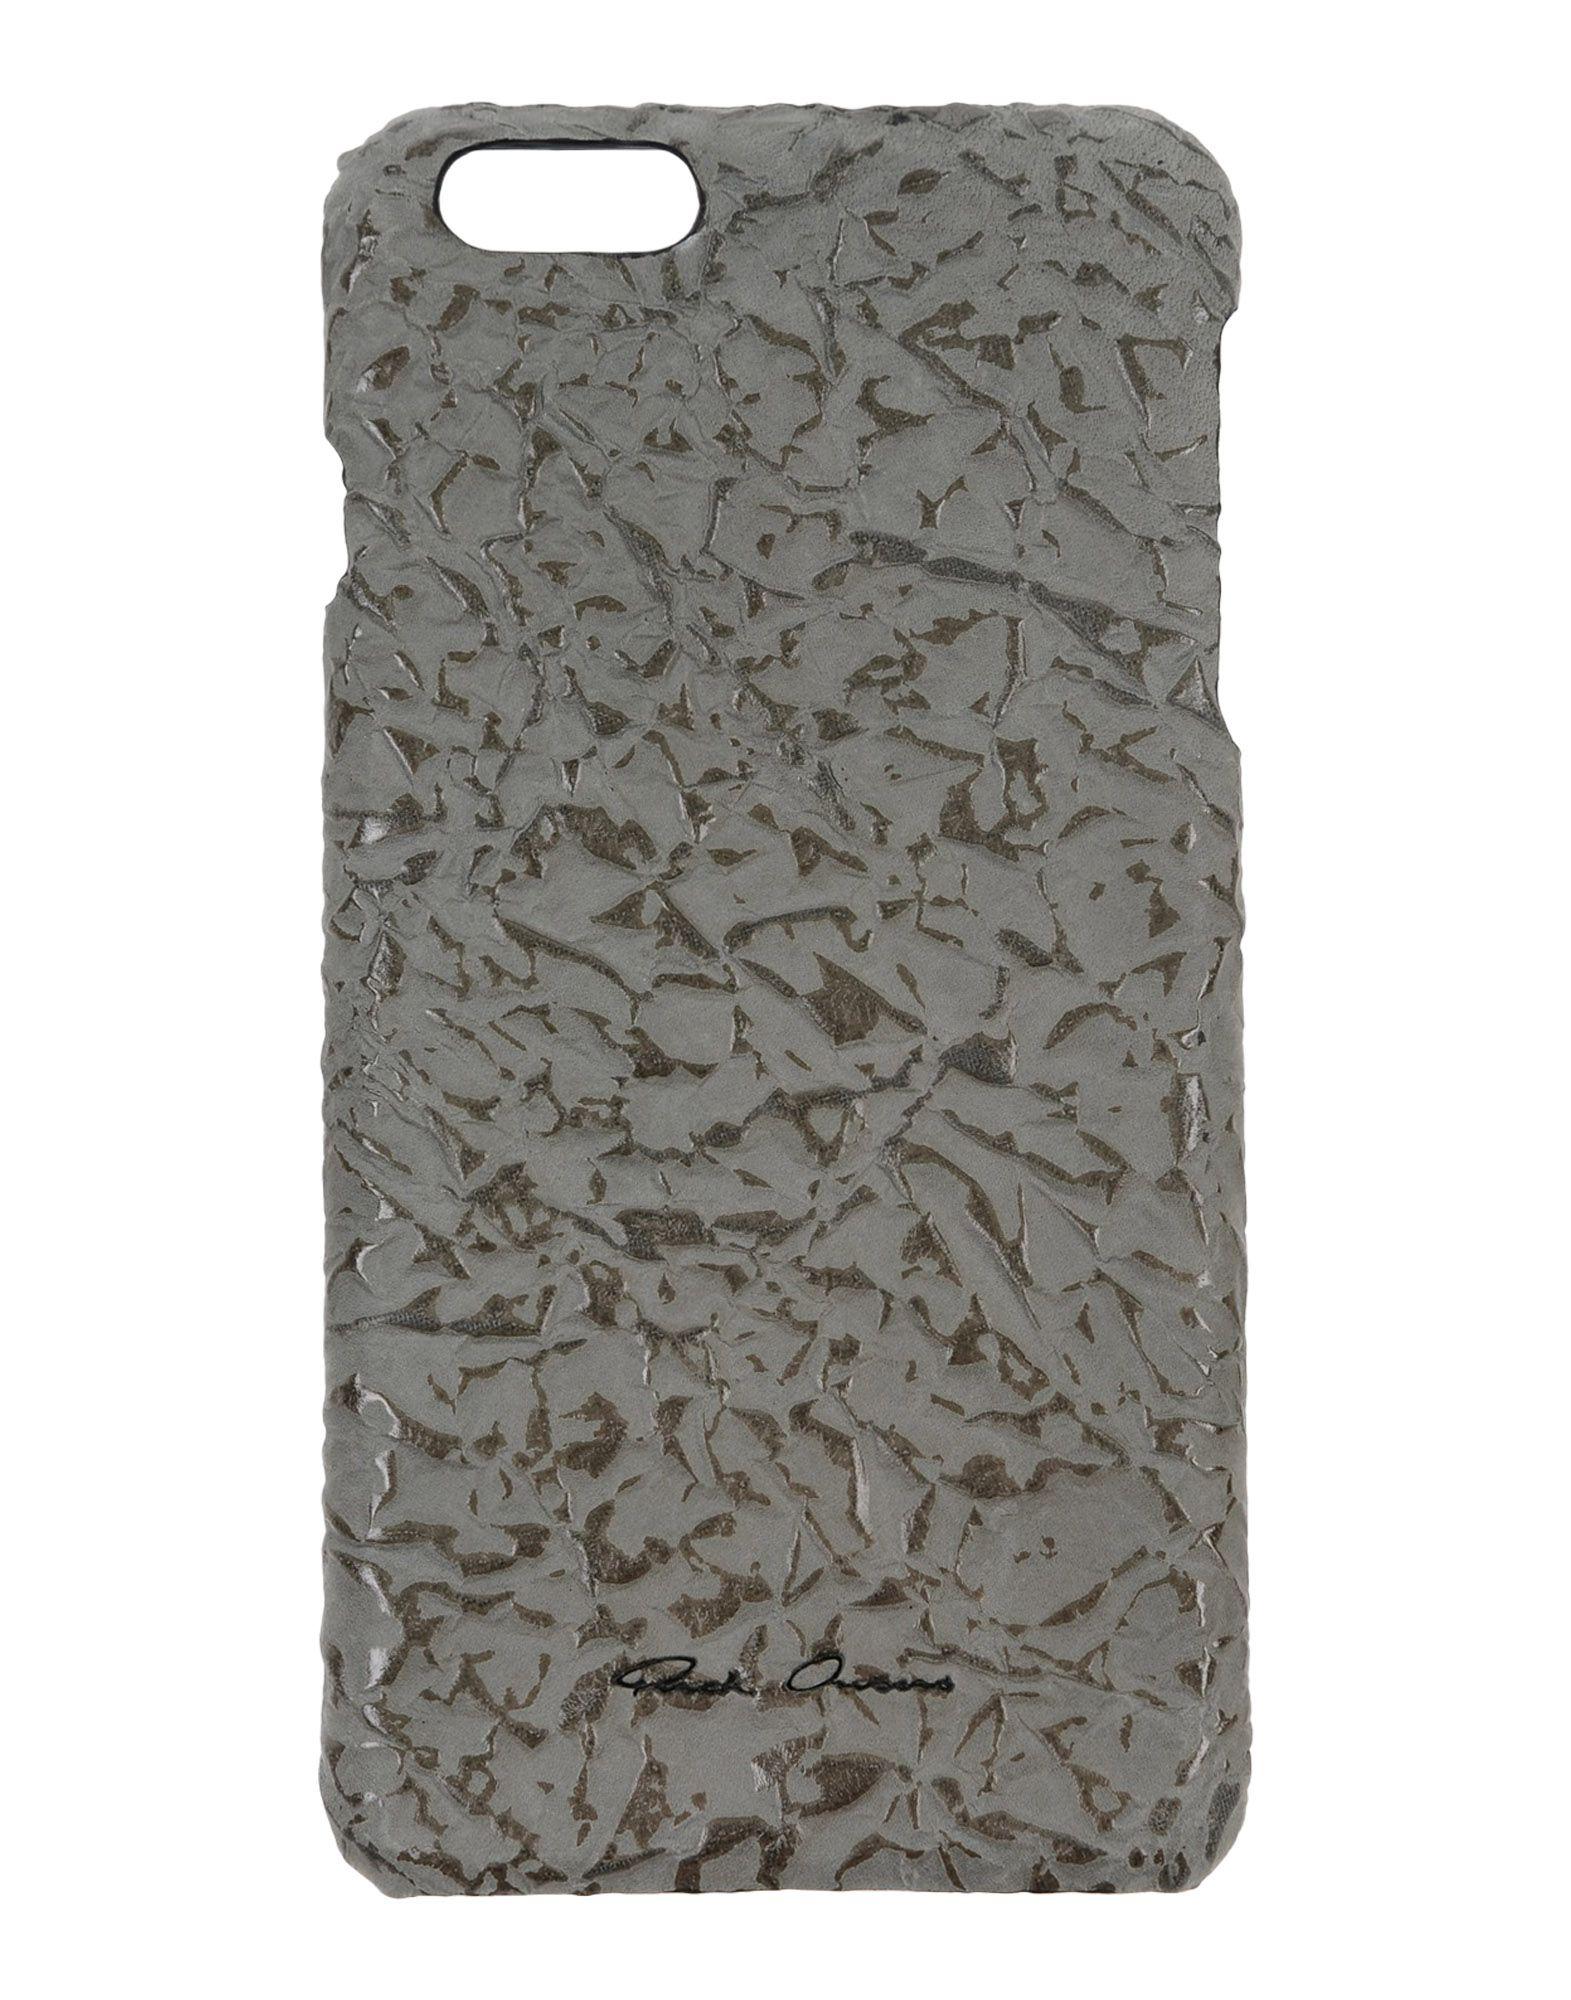 RICK OWENS Чехол чехол накладка для iphone 5 5s 6 6s 6plus 6s plus змеиный дизайн